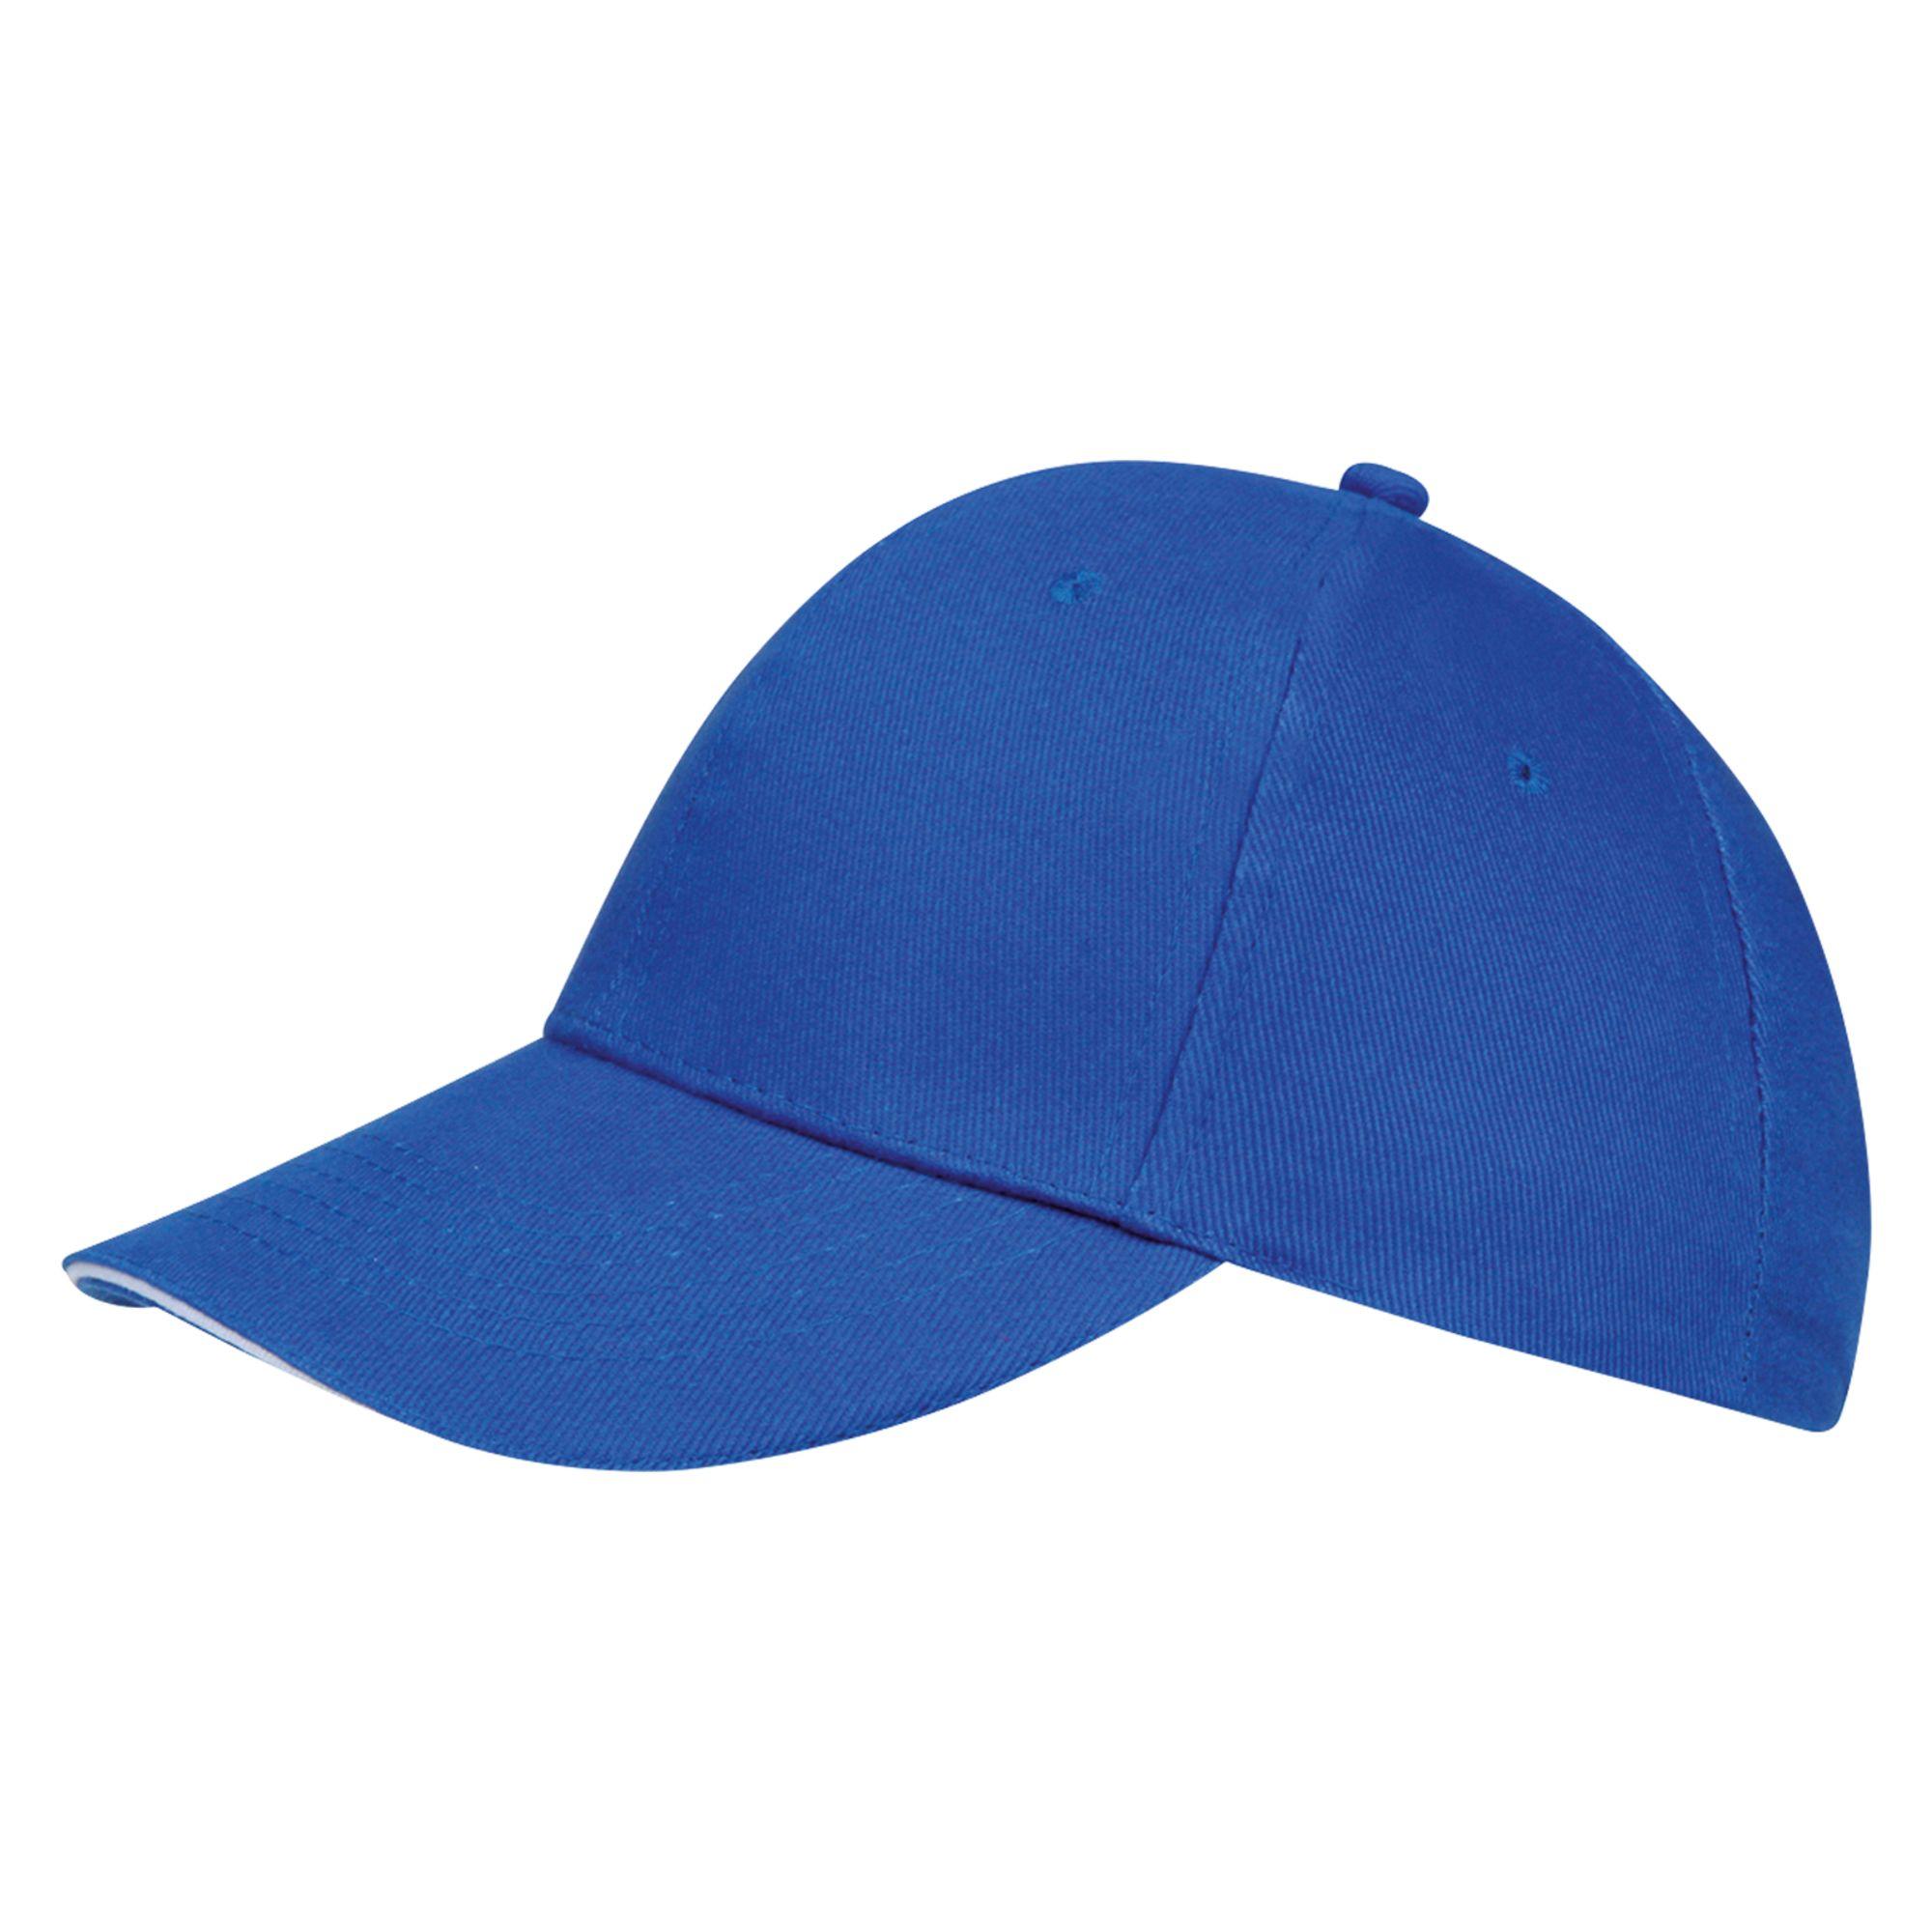 Бейсболка BUFFALO, ярко-синяя с белым